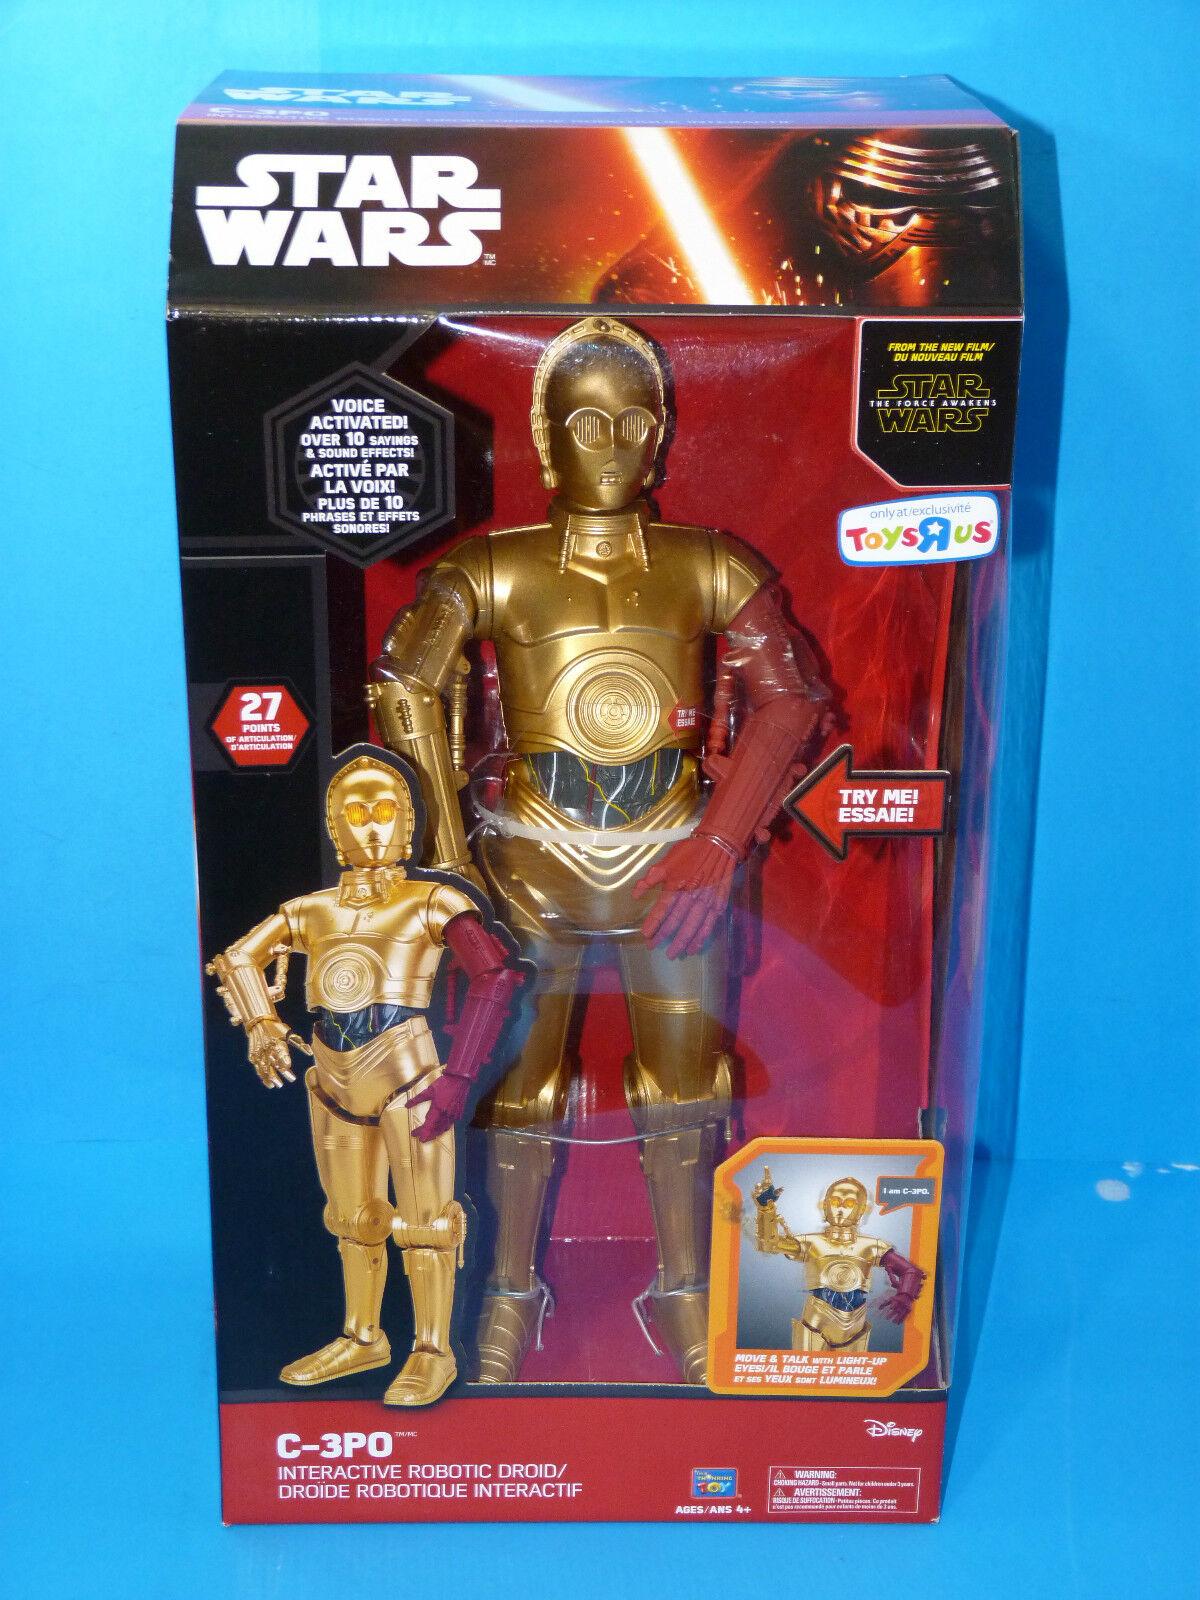 stjärnornas krig Deluxe samlaor s Edition C -3PO Talking Interactive Robotic Droid leksak